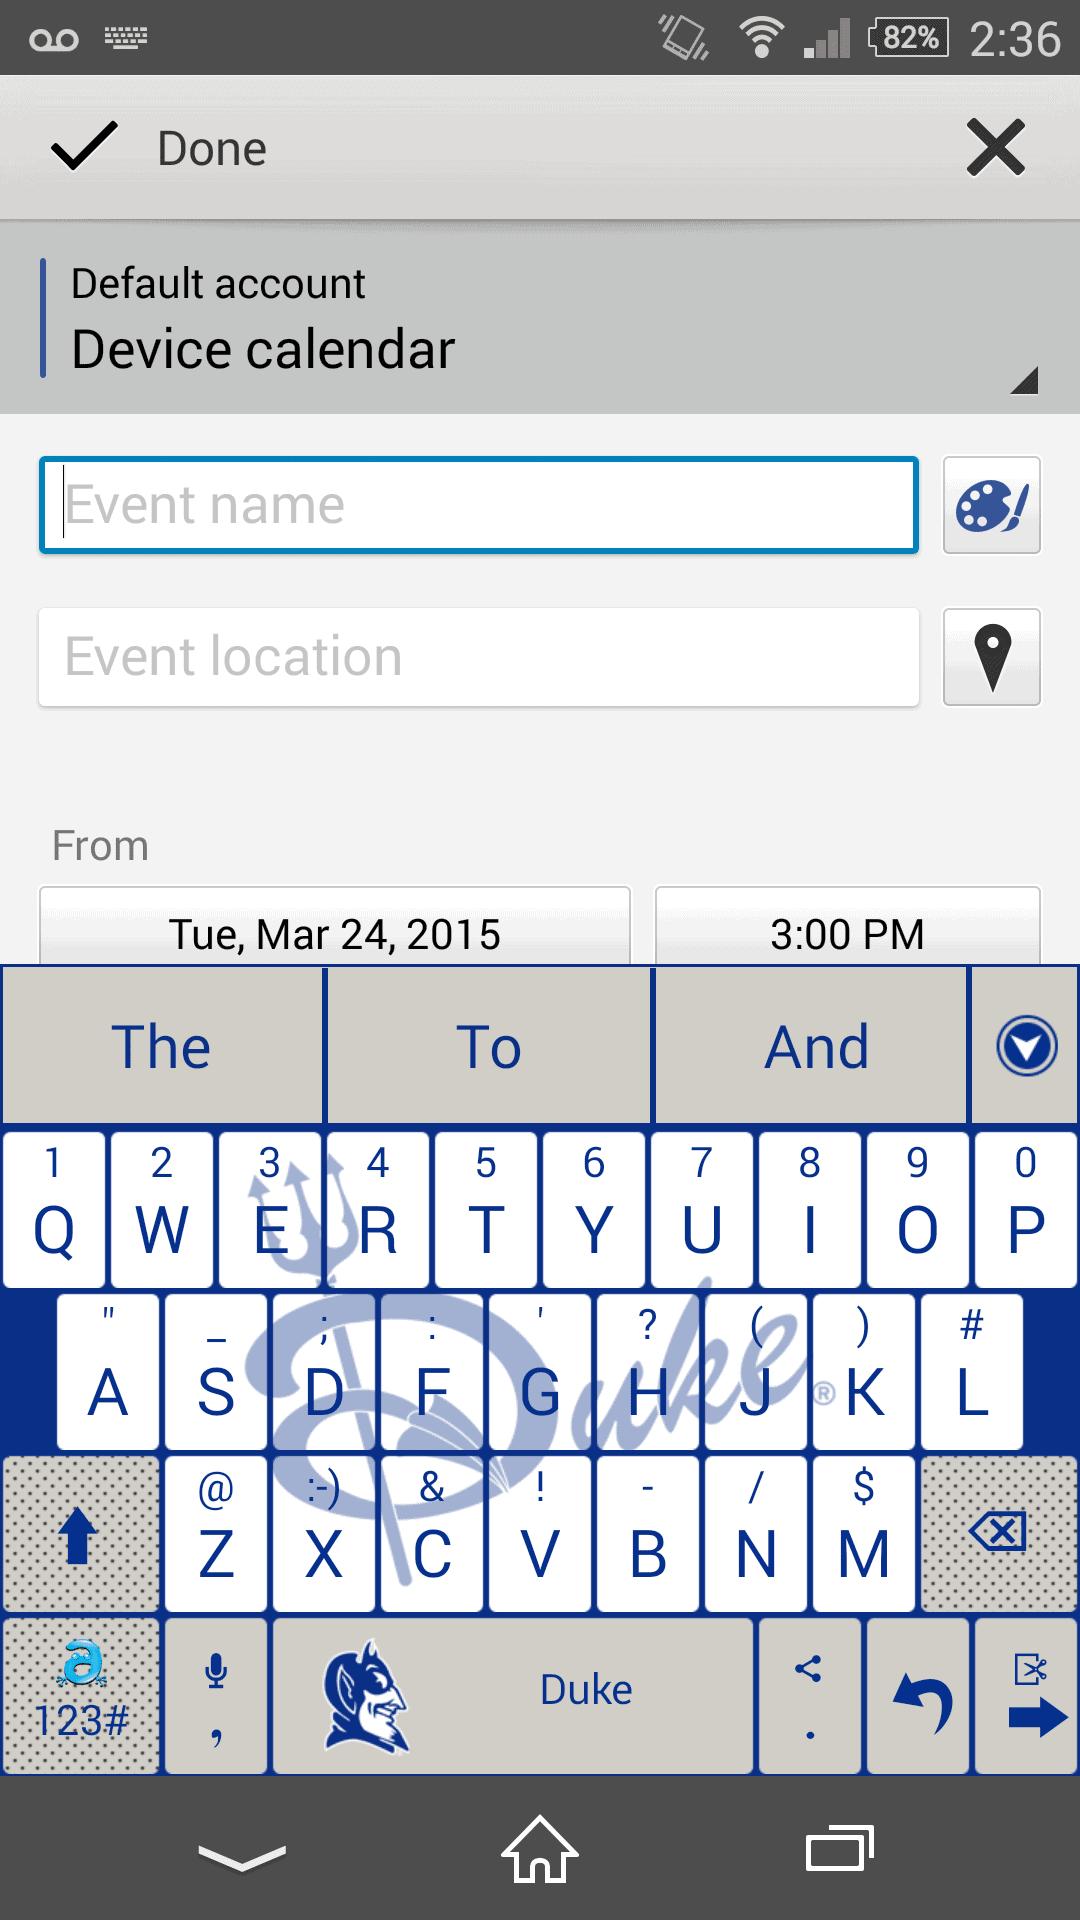 Screenshot (02-36PM, Mar 24, 2015)